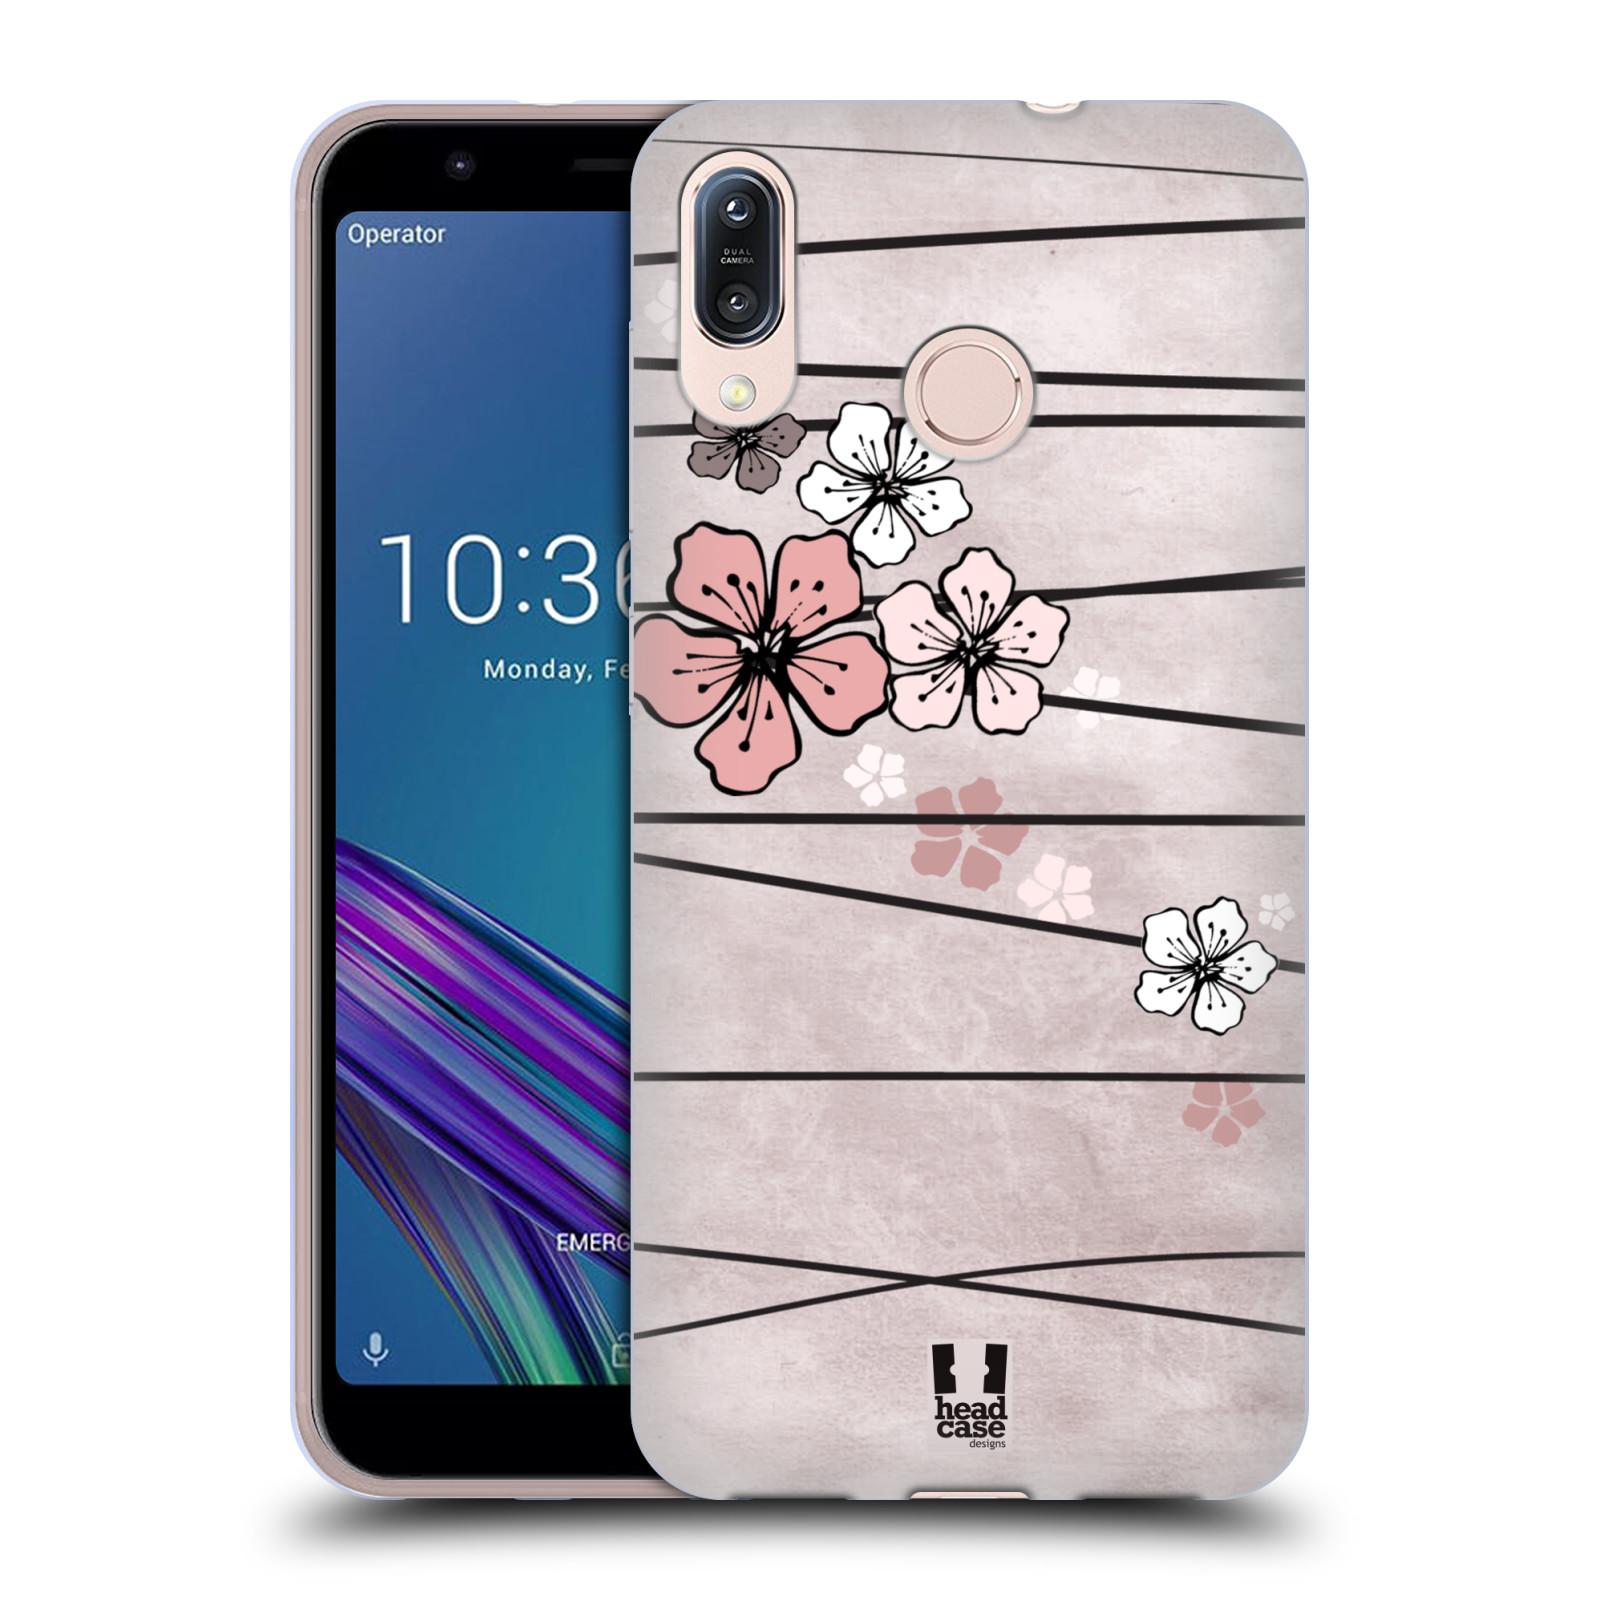 Silikonové pouzdro na mobil Asus Zenfone Max M1 ZB555KL - Head Case - BLOSSOMS PAPER